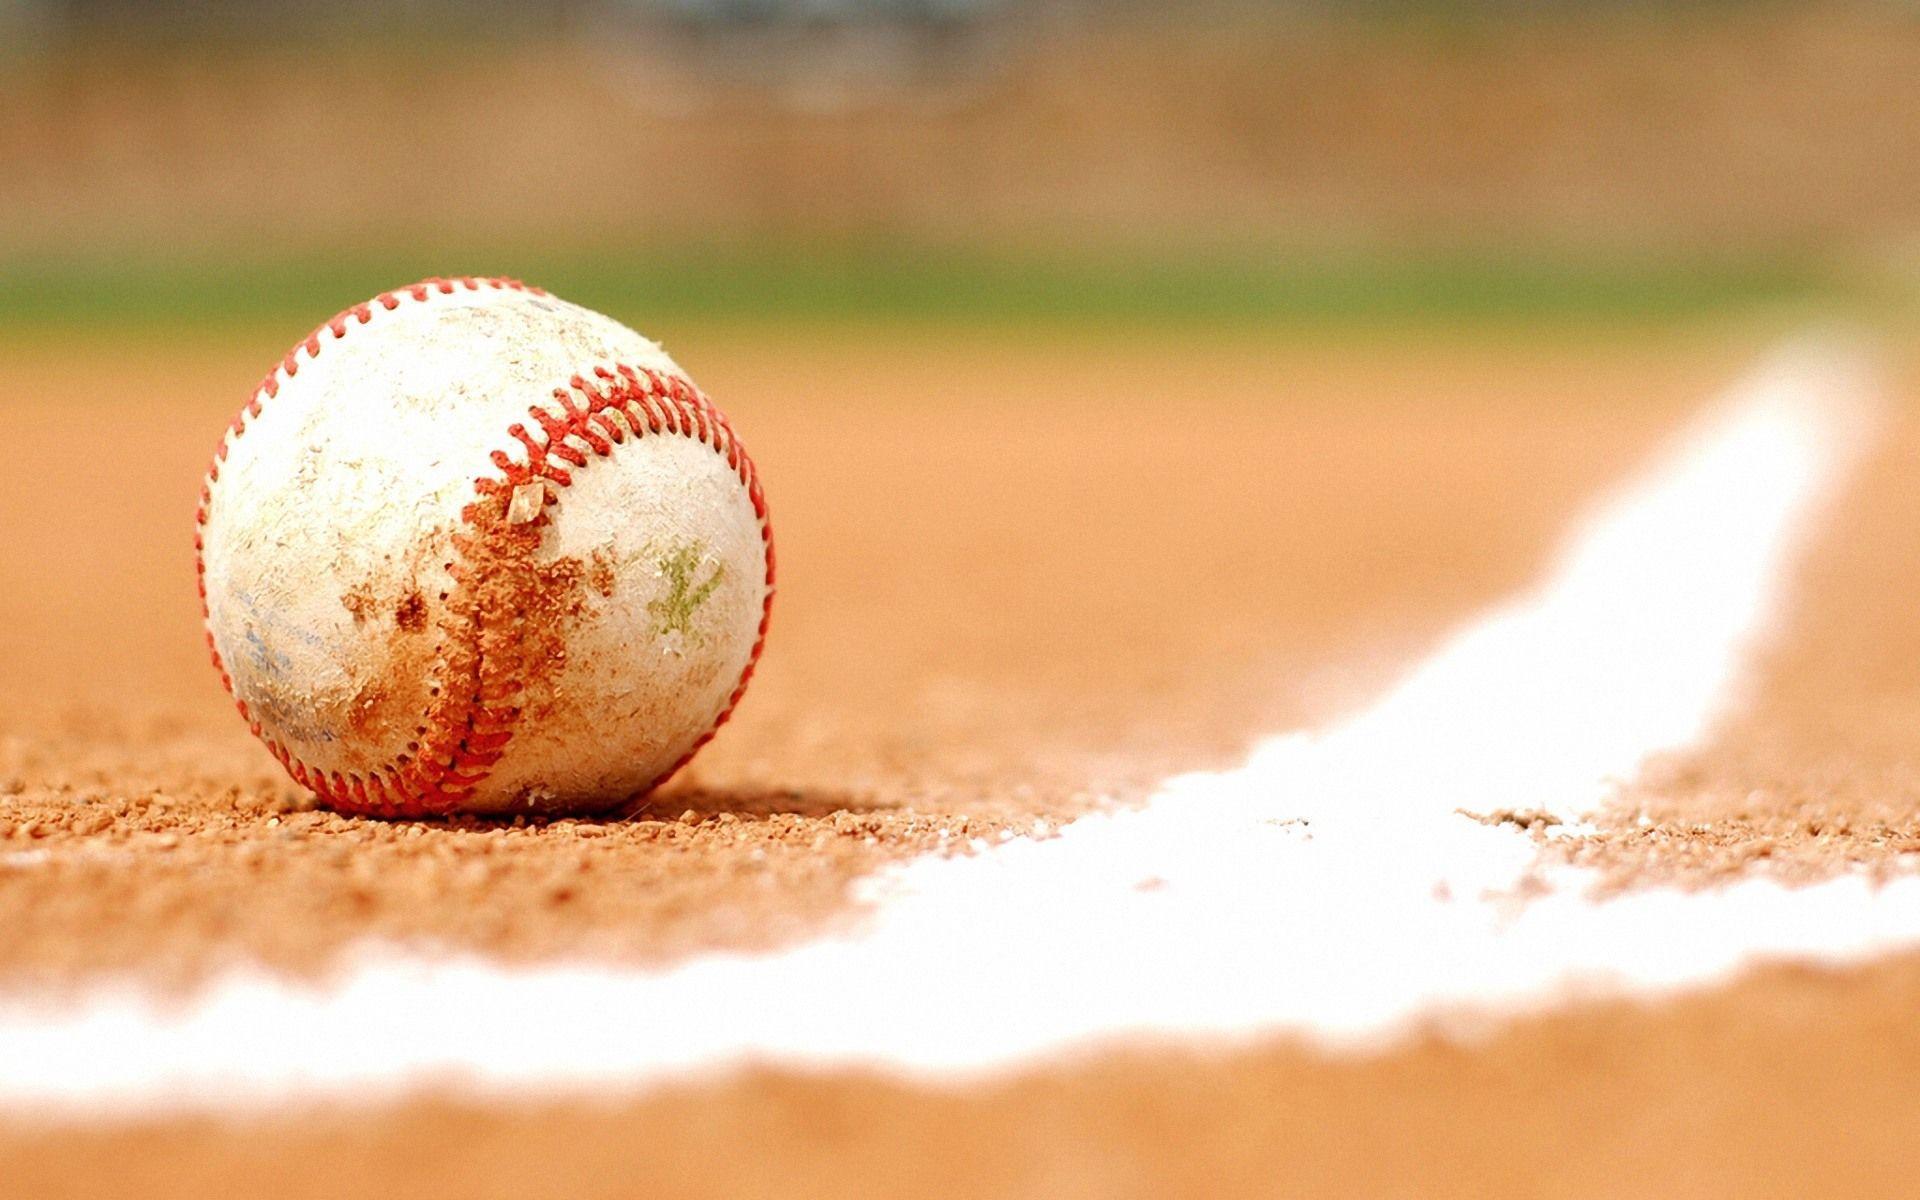 Free Baseball Wallpapers Wallpaper Cave